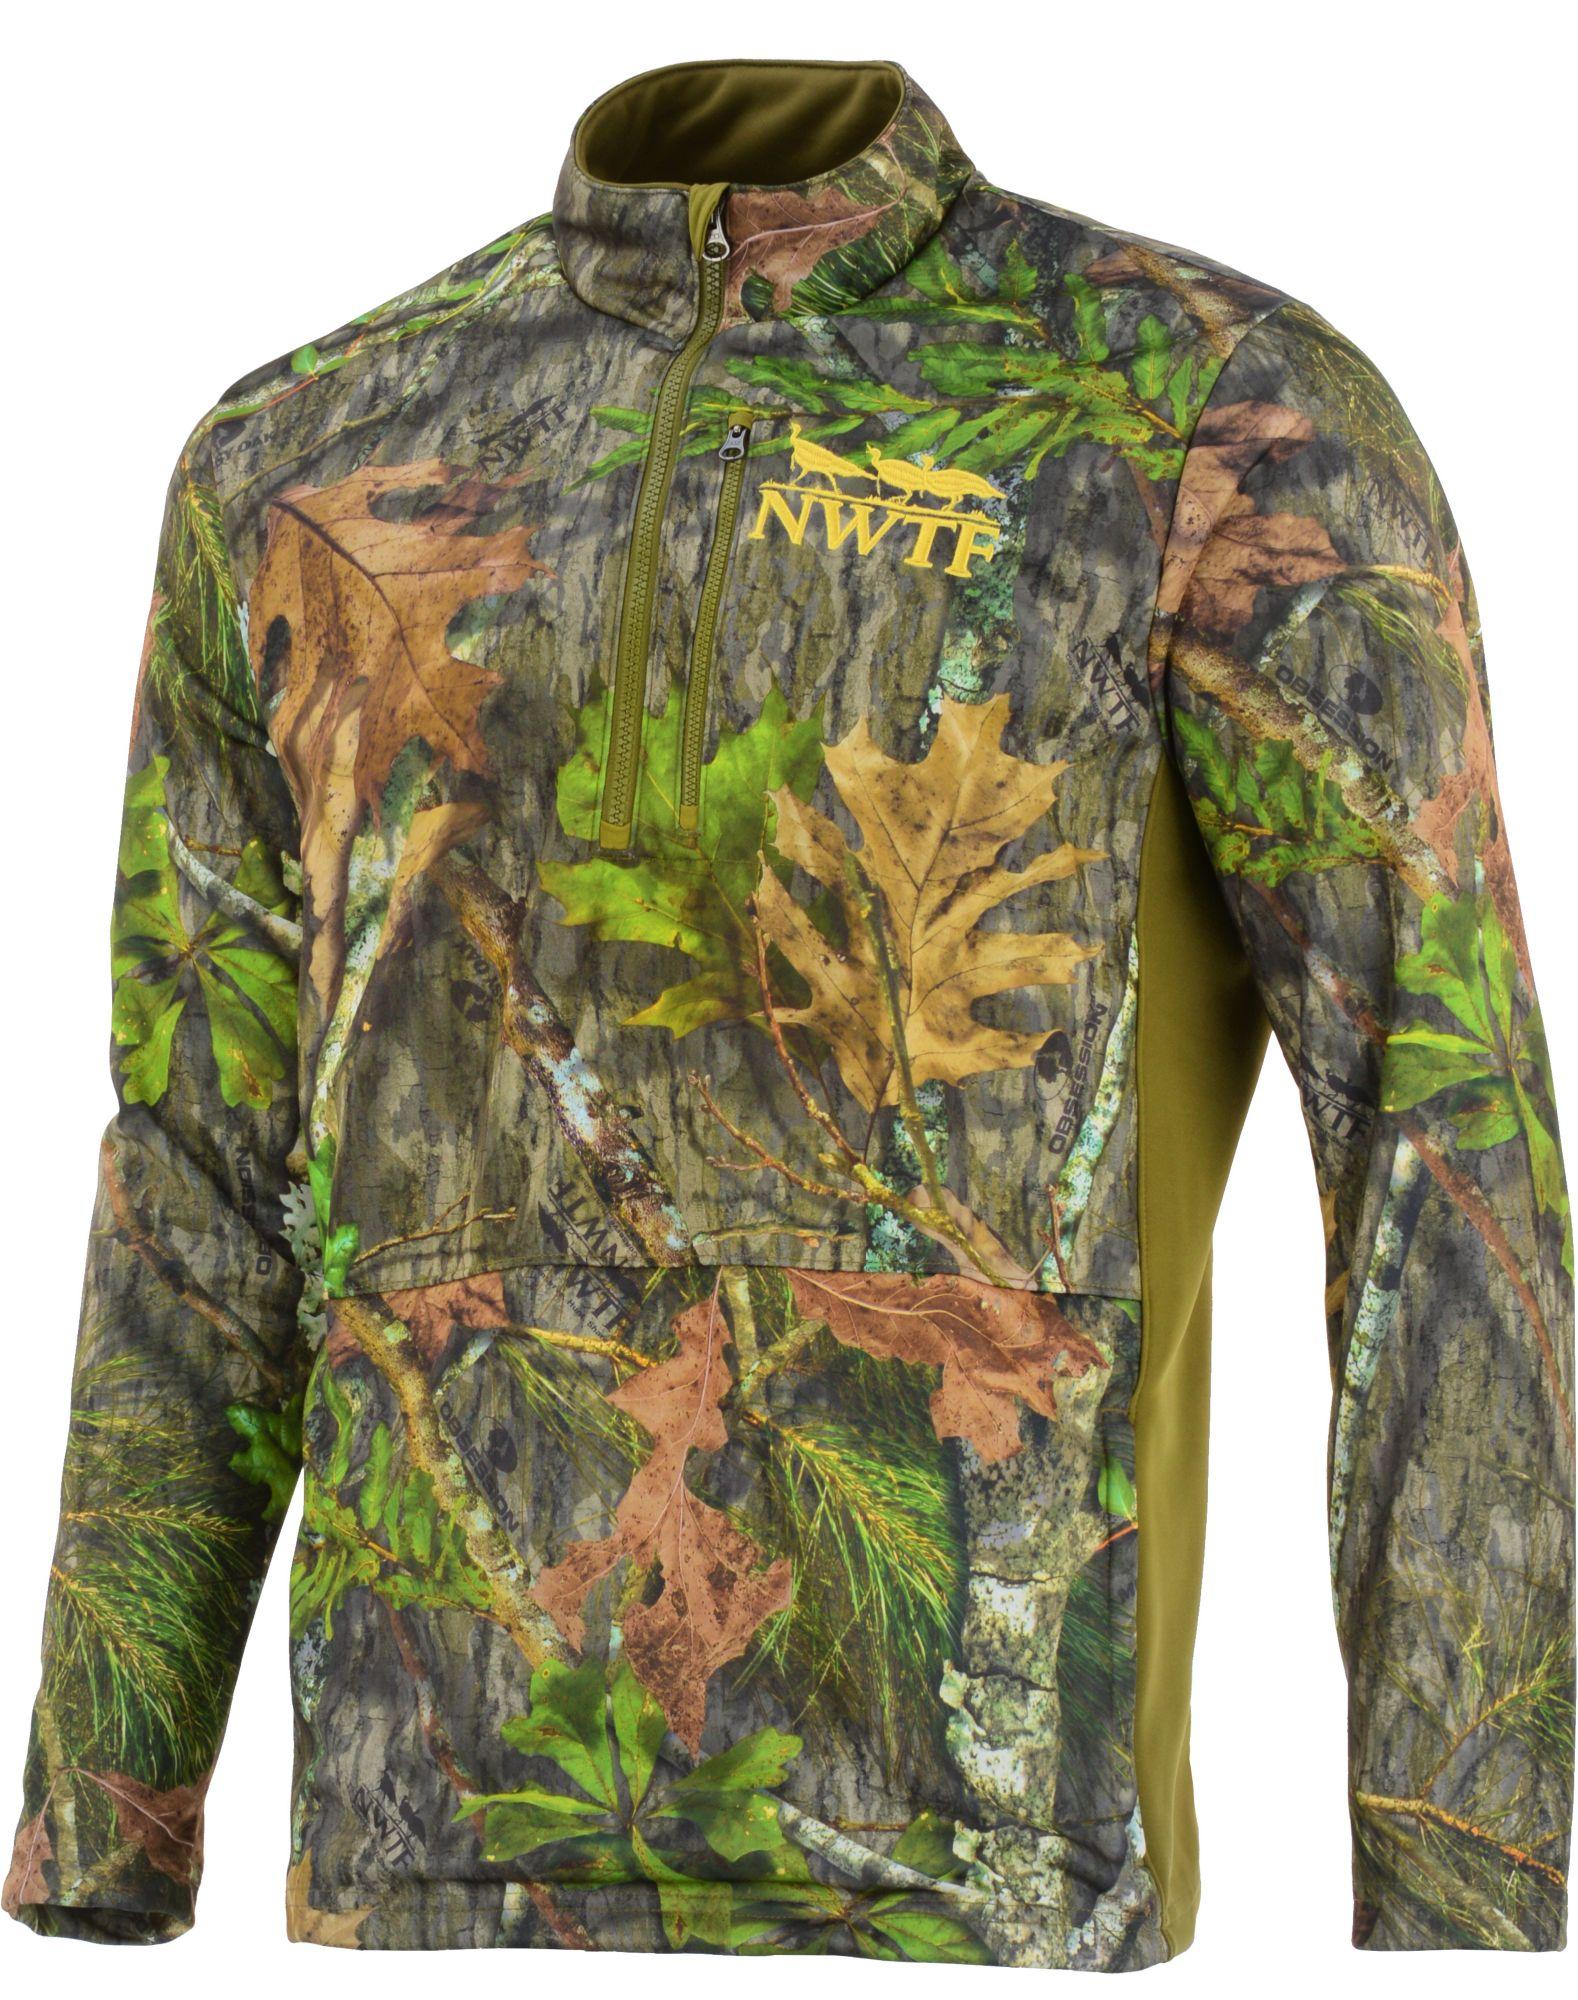 Nomad Men's Nwtf 1/4 Zip Fleece Hunting Jacket, Size: Medium, Green thumbnail